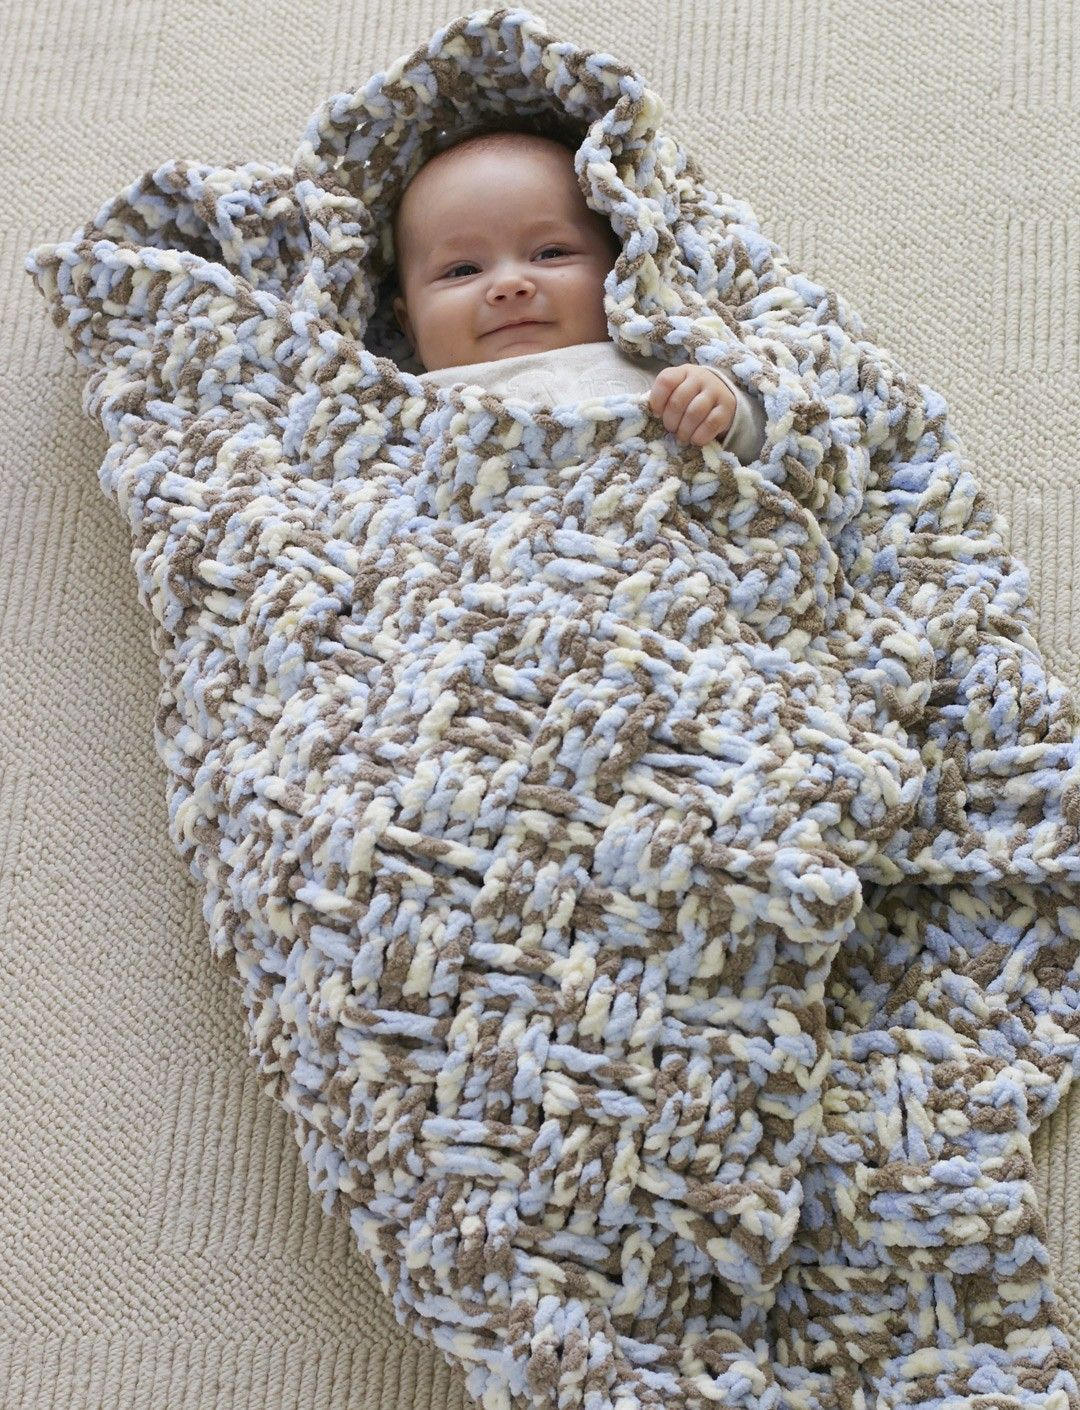 Bernat Baby Blanket Yarn Patterns Amazing Design